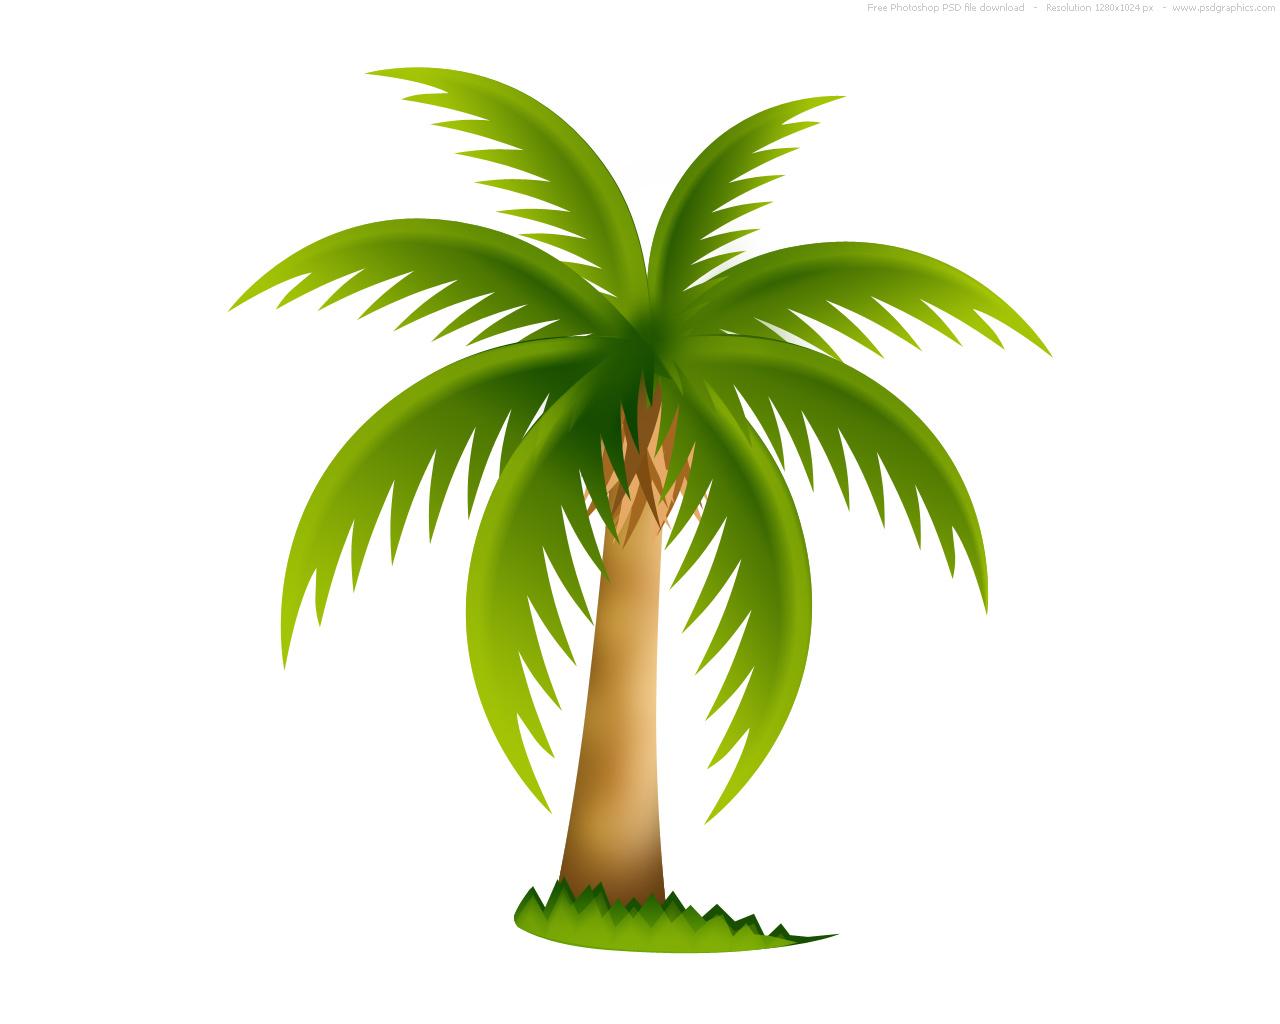 Free Transparent Cartoon Palm Tree, Download Free Clip Art.